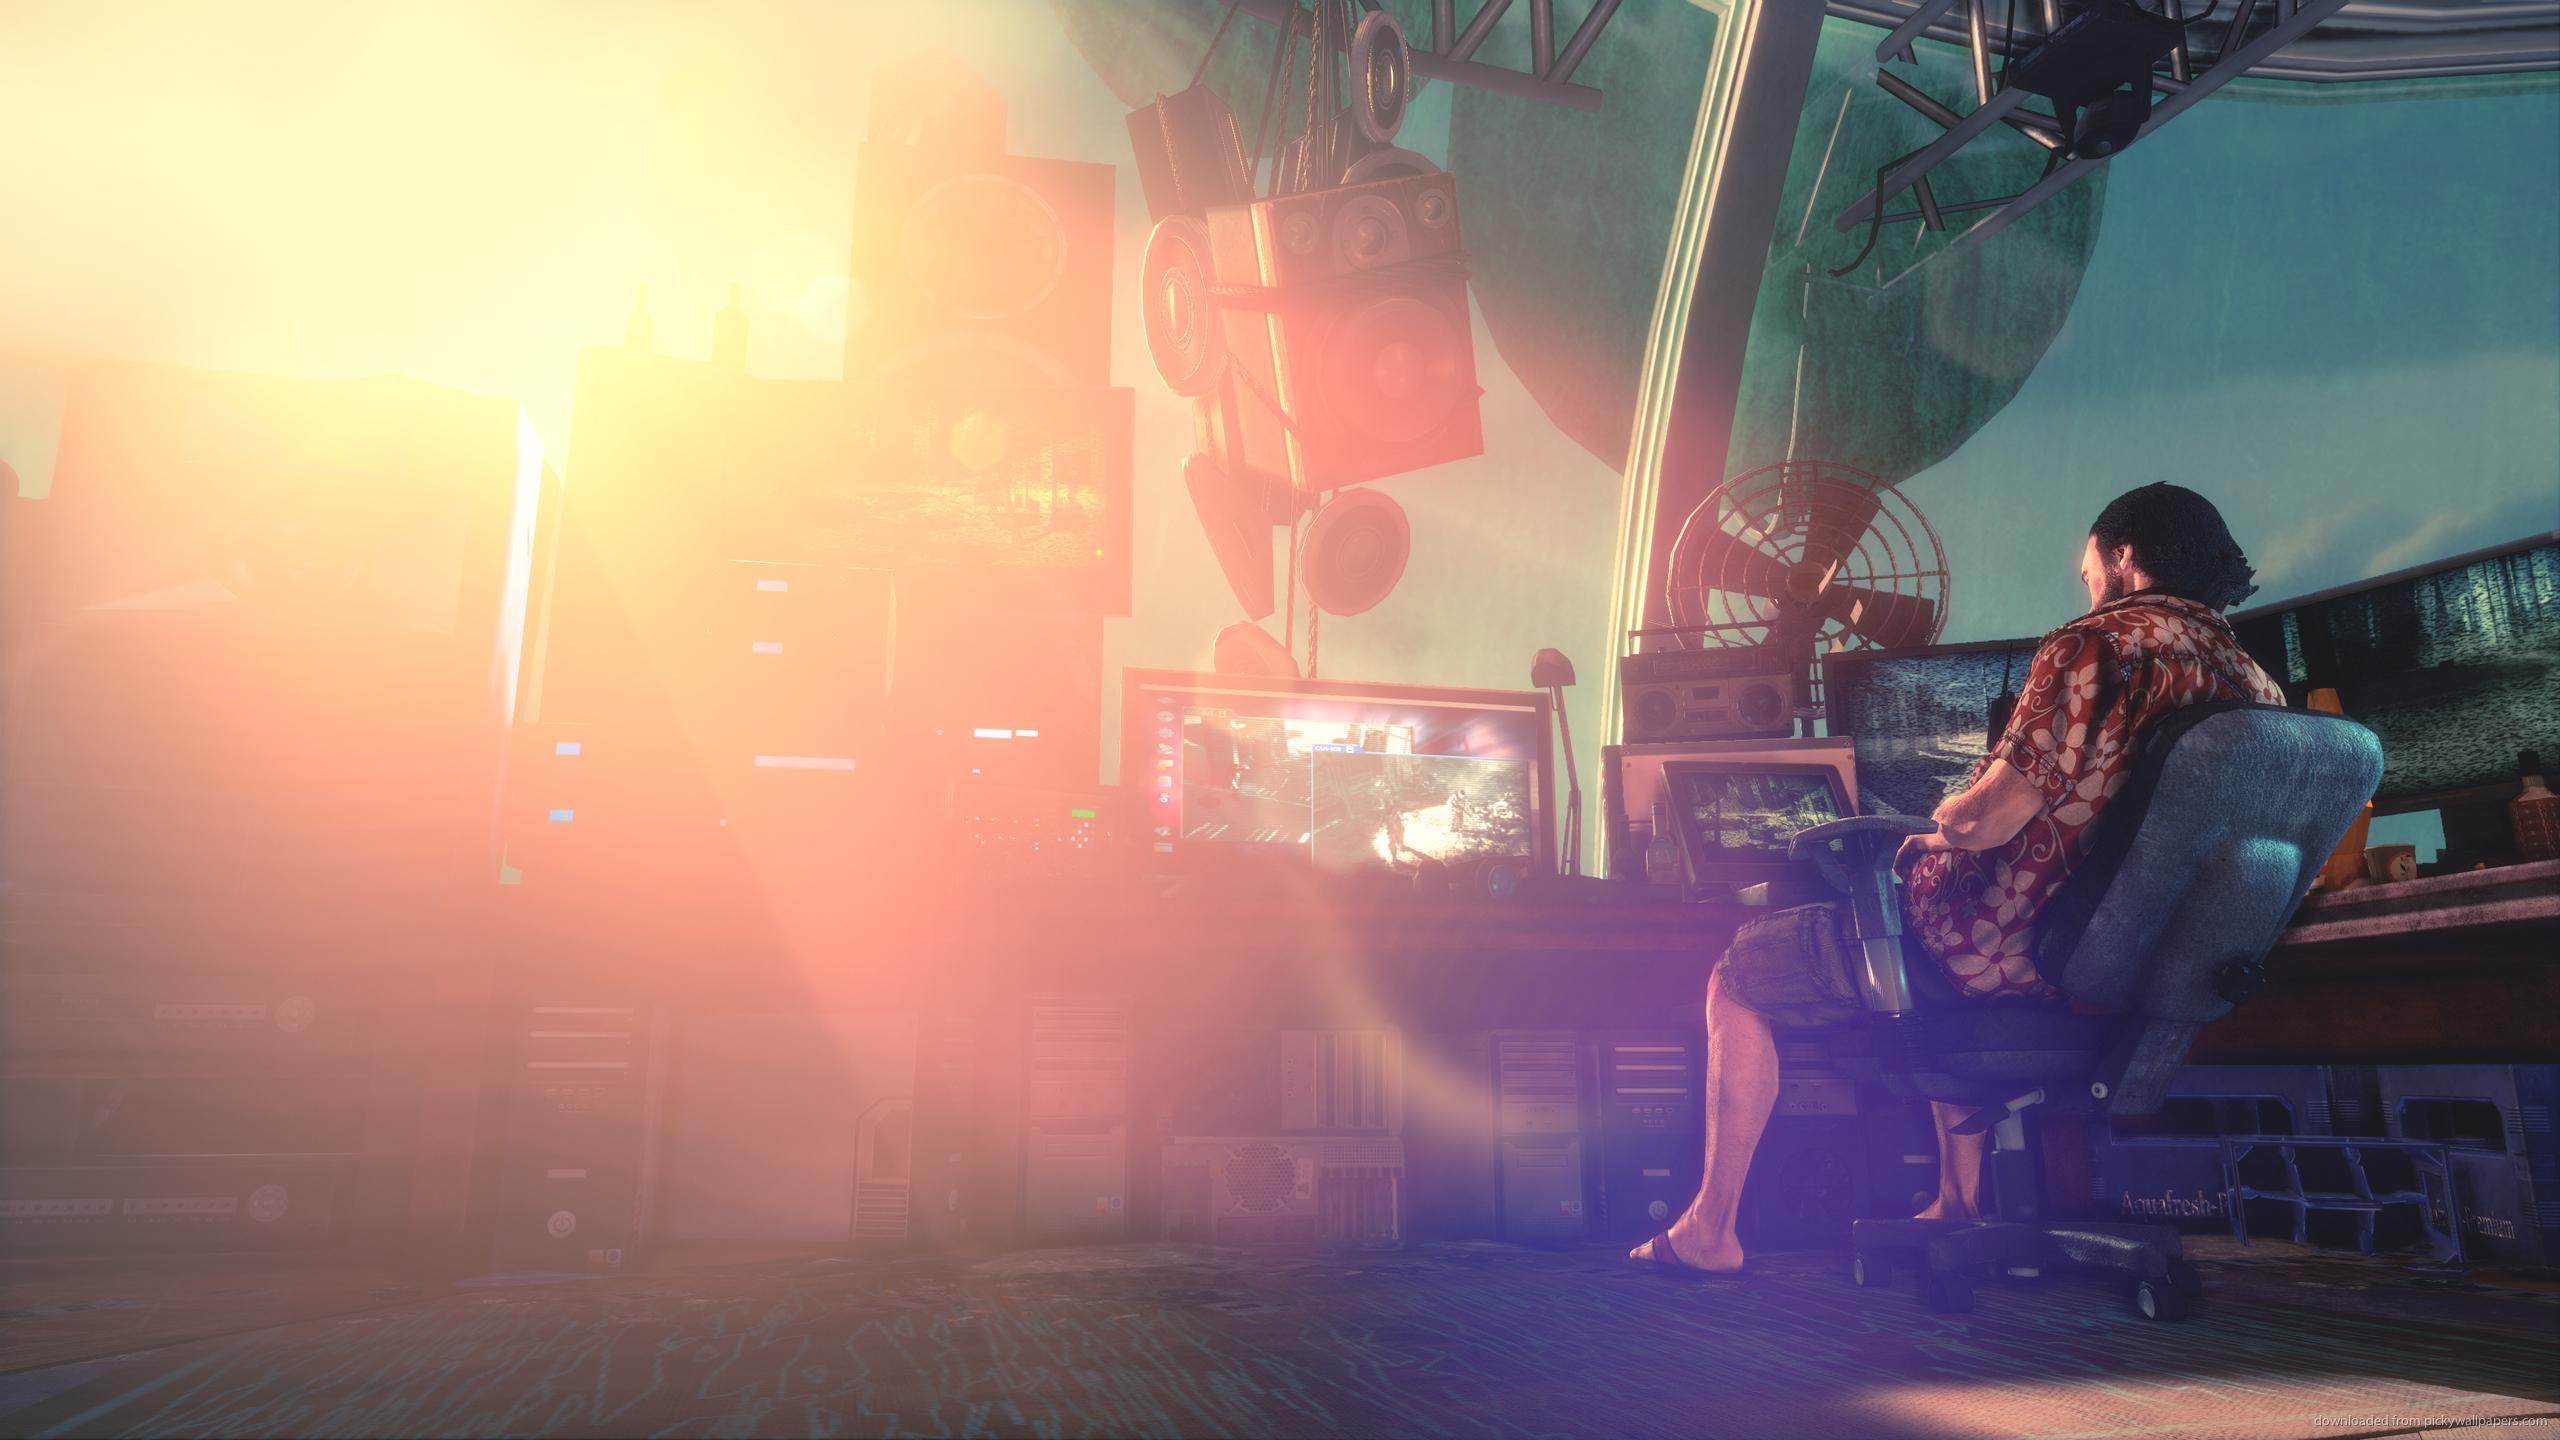 HD DJ Shadow 4k Background for PC